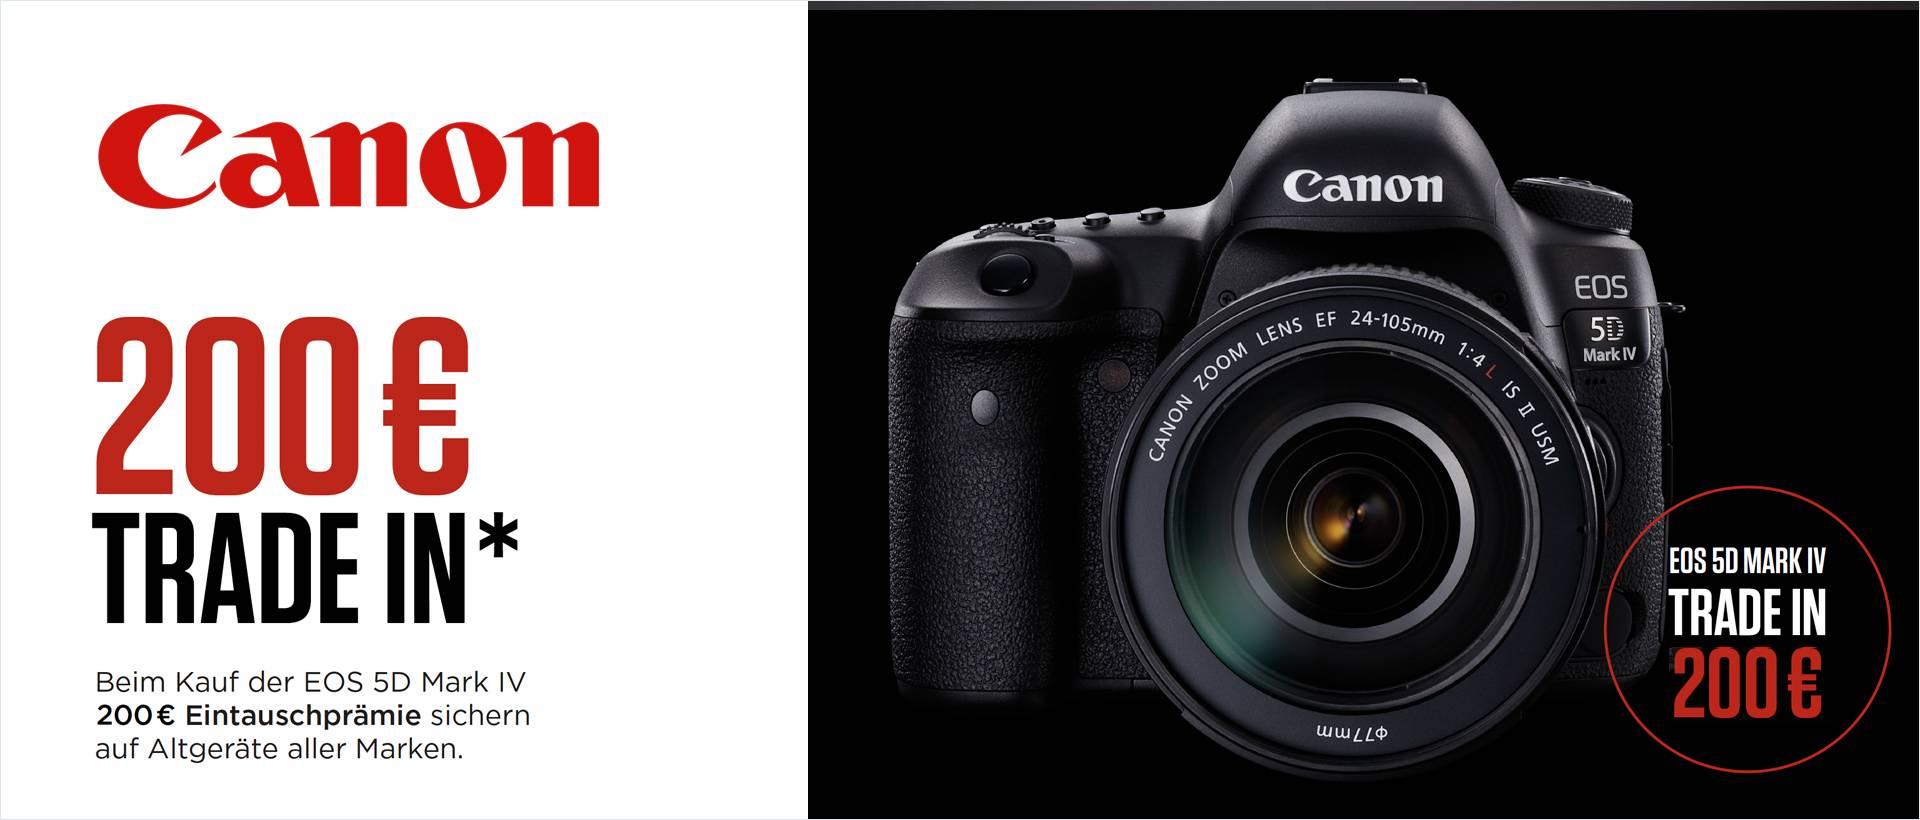 Canon EOS 5D Mark IV Aktion